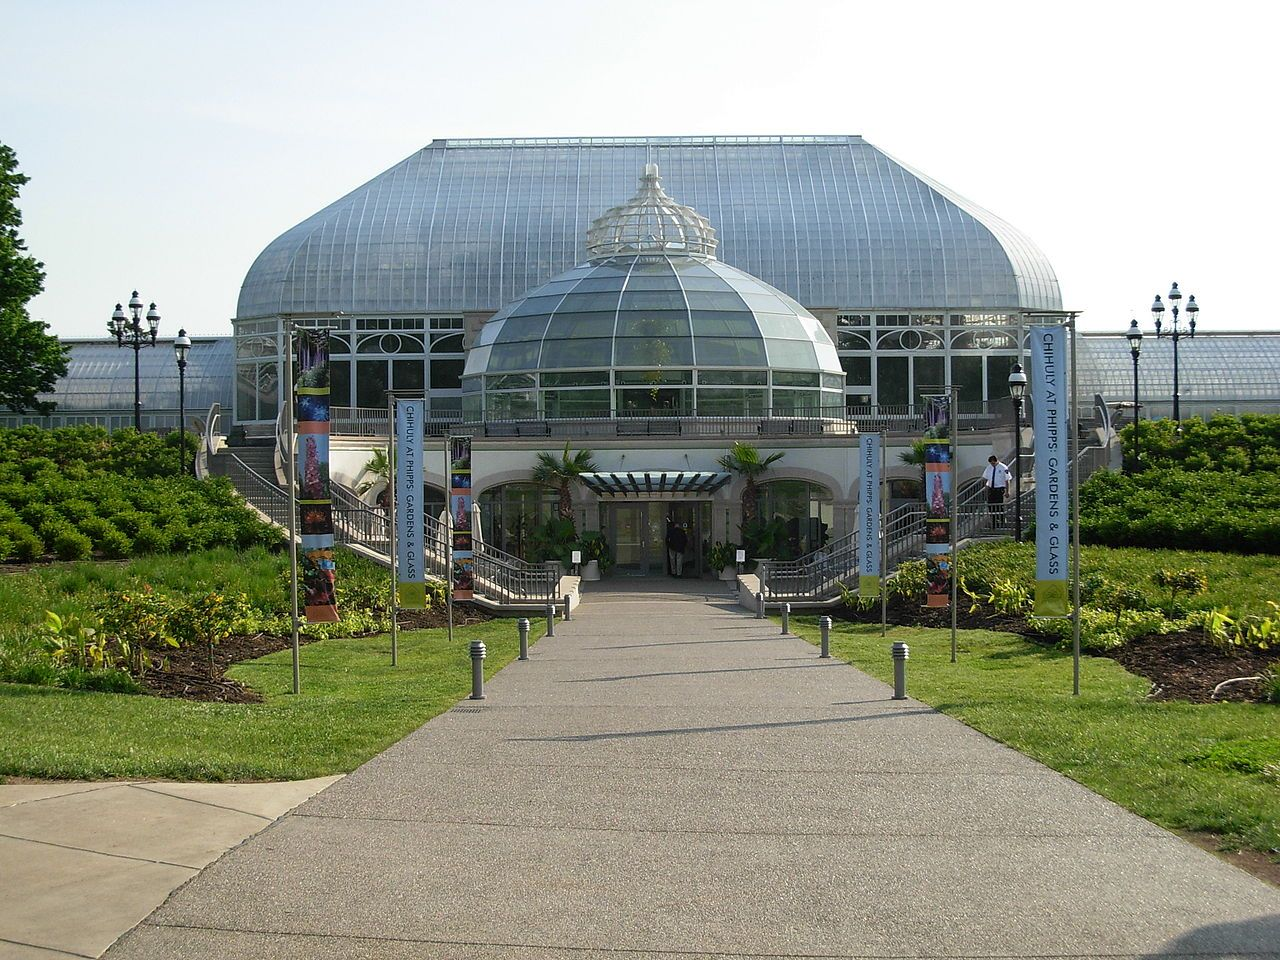 01b80e68d2a369a77f744666daca62cd - Phipps Conservatory And Botanical Gardens Parking